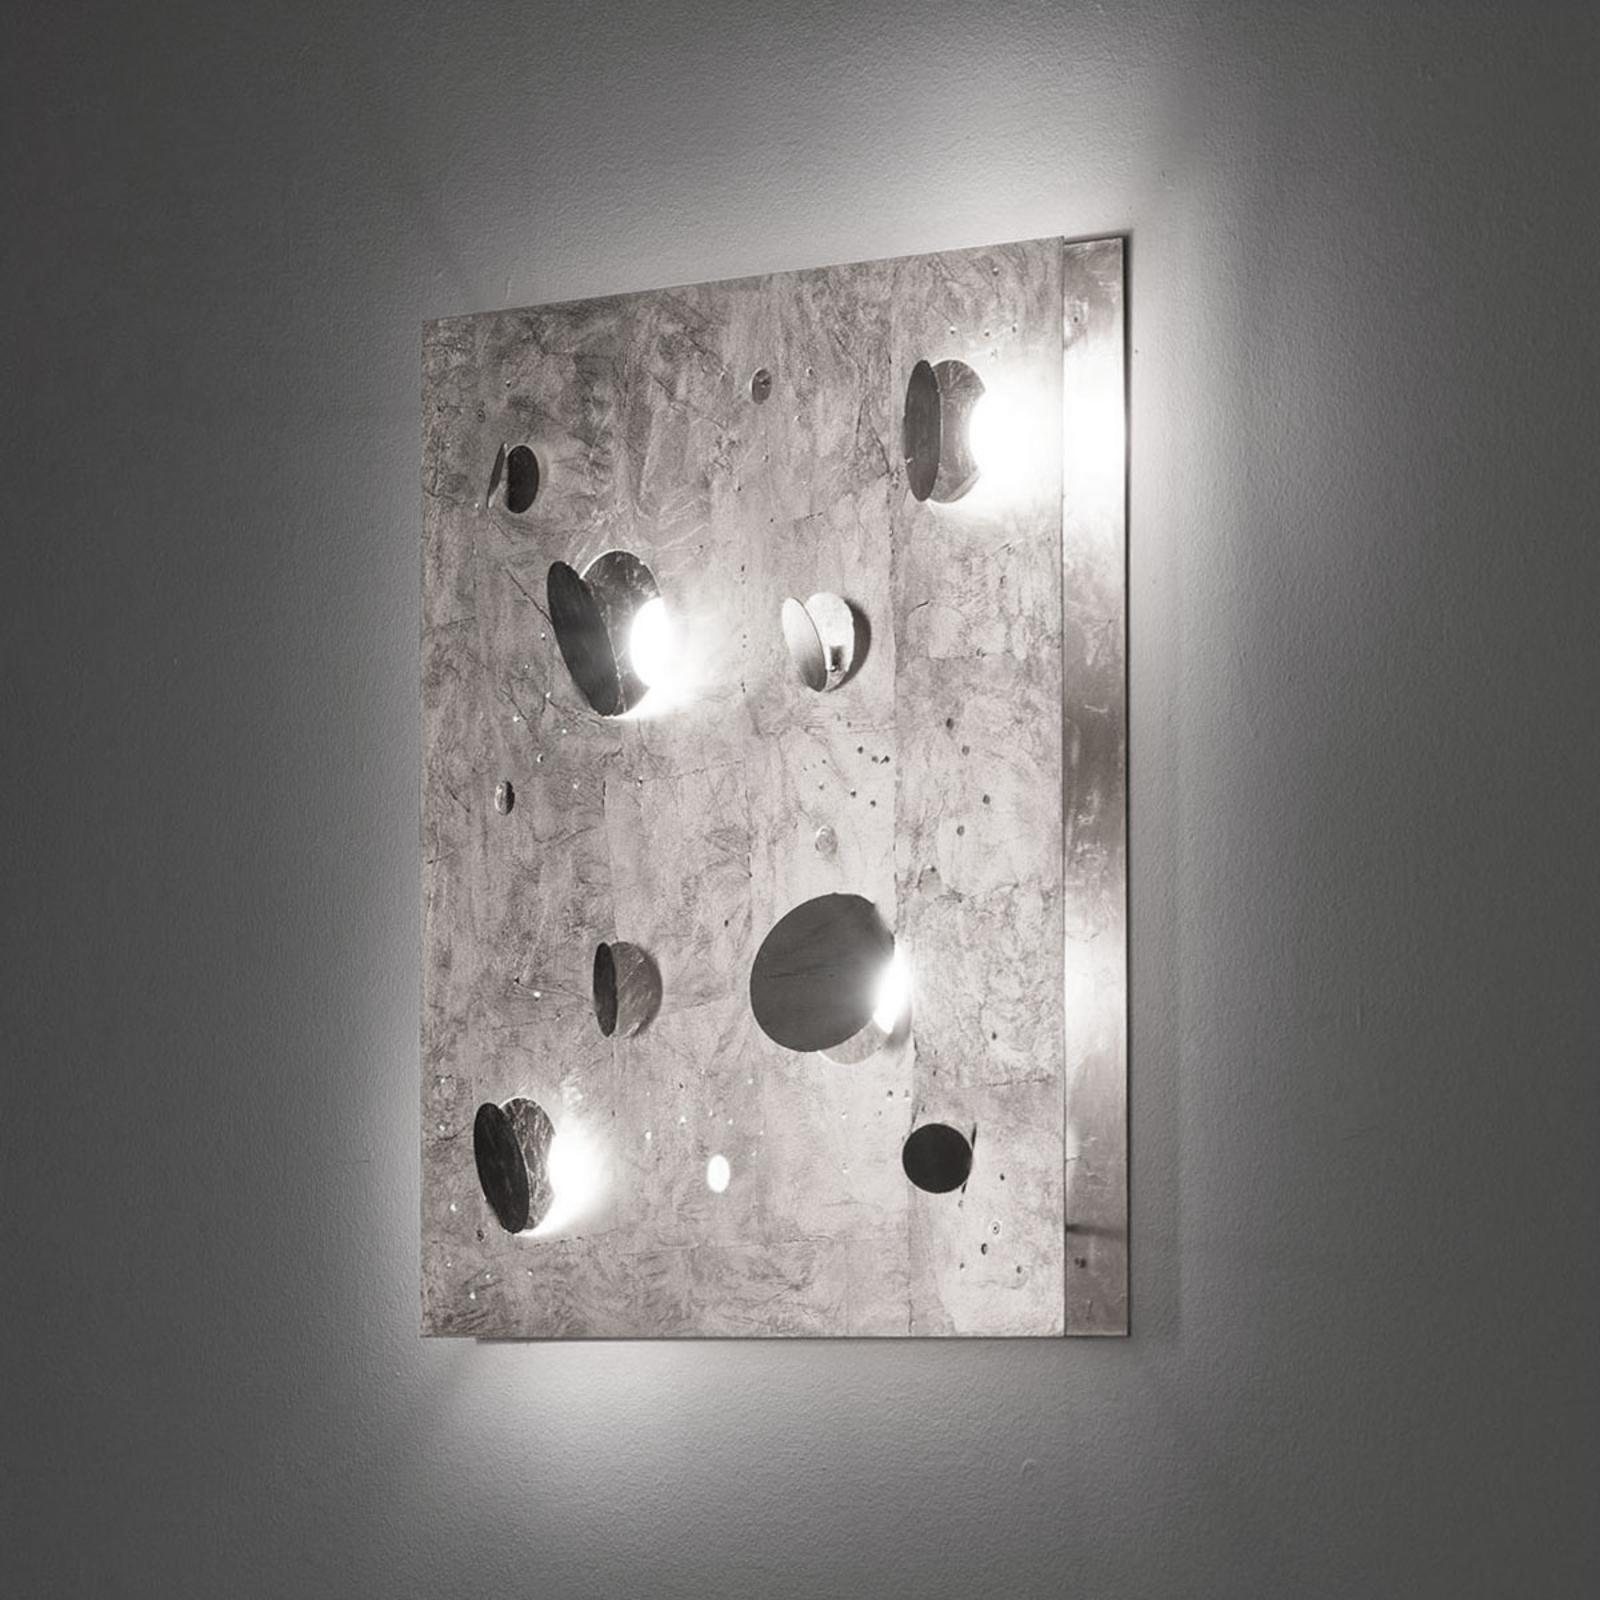 Knikerboker Buchi wandlamp 60x60cm bladzilver